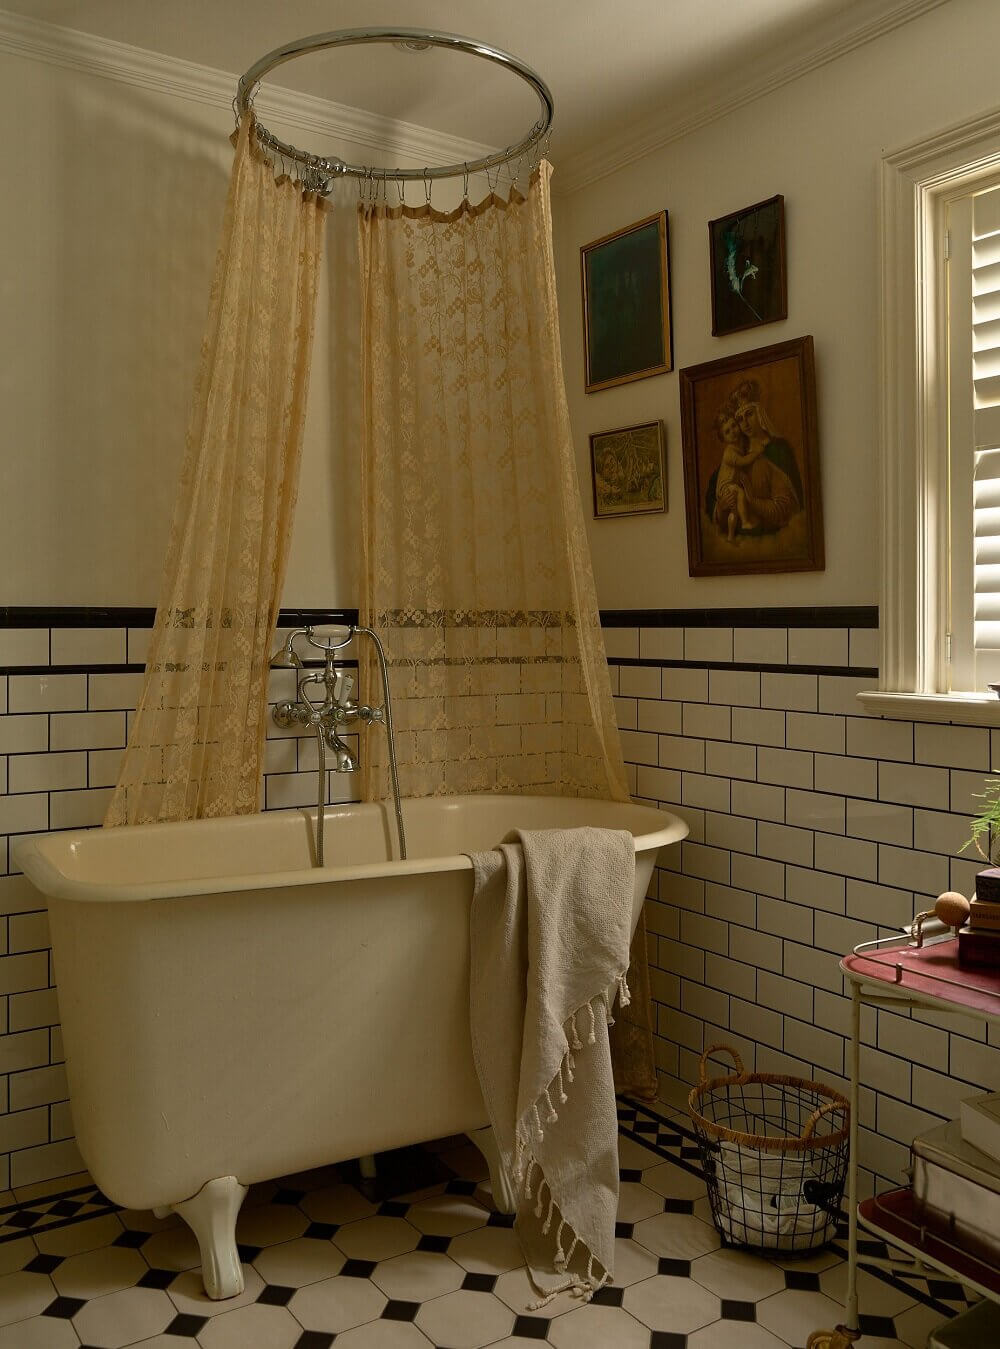 vintage-bathroom-idyllic-swedish-house-tower-room-nordroom